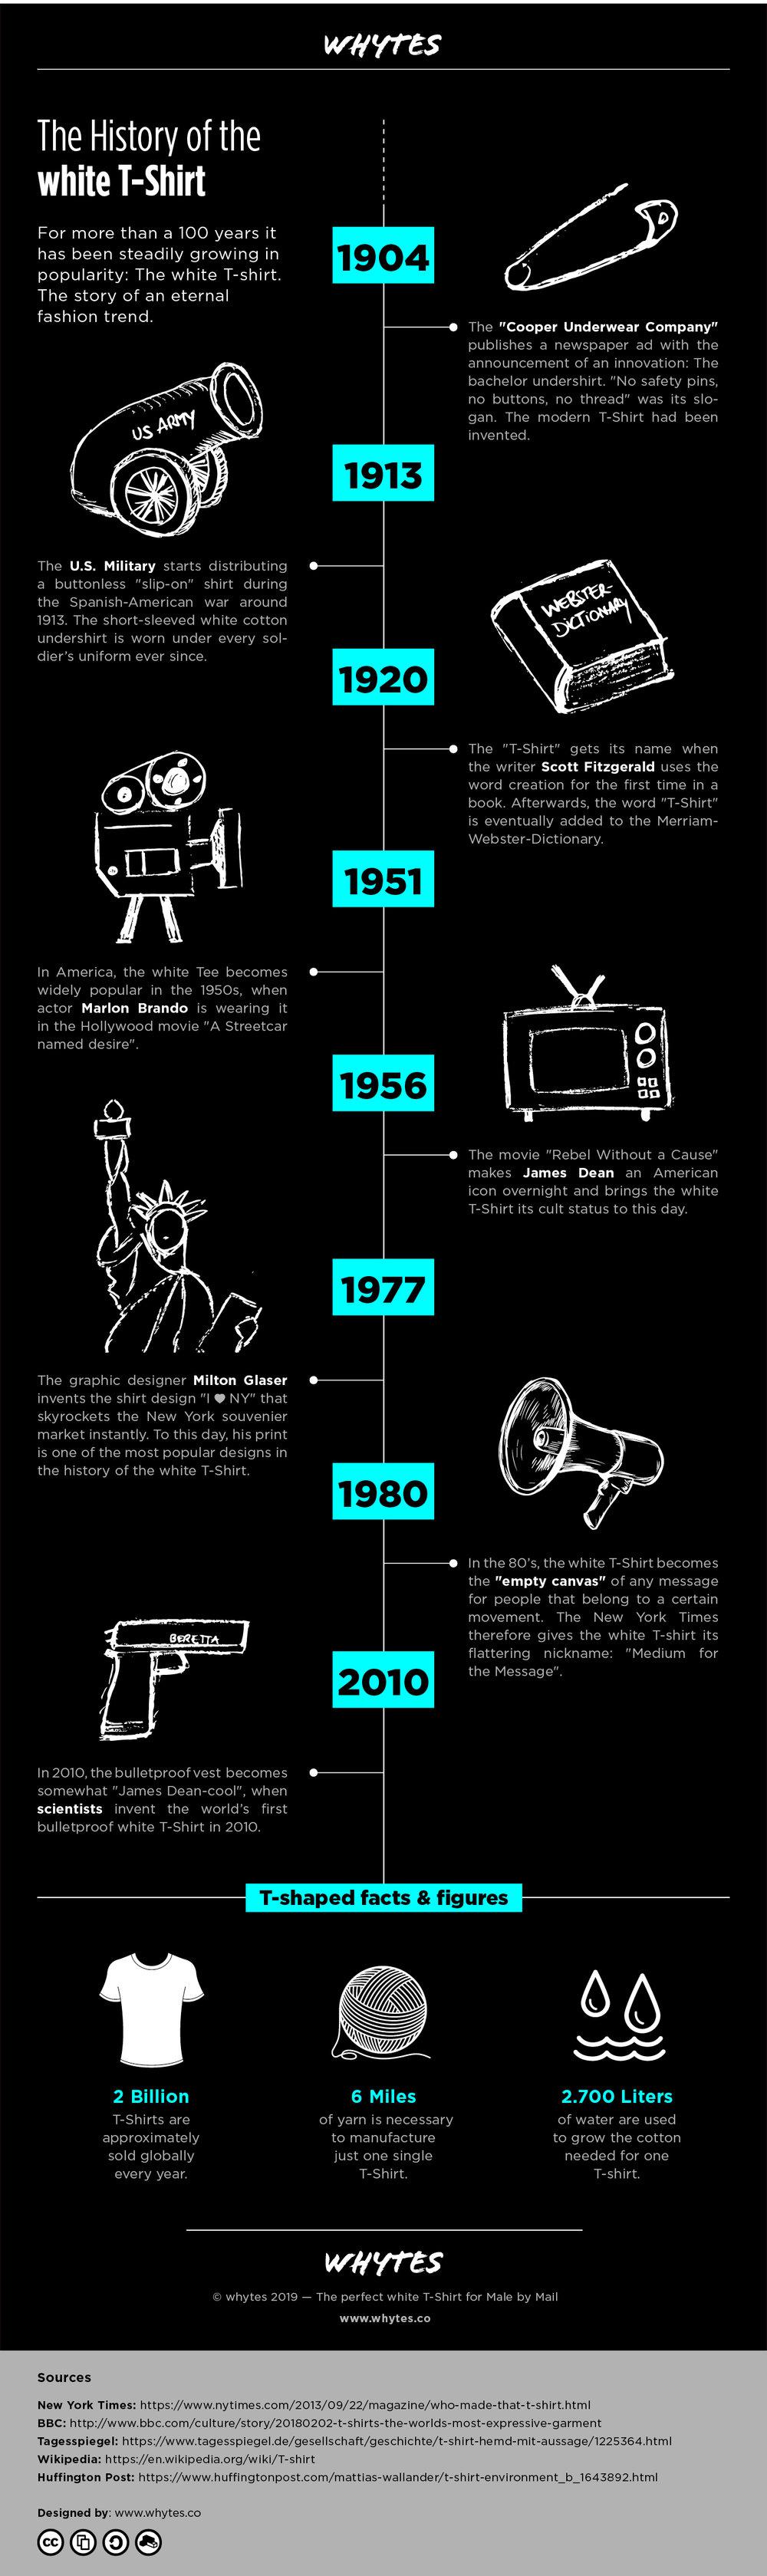 history-t-shirt-whytes.jpg